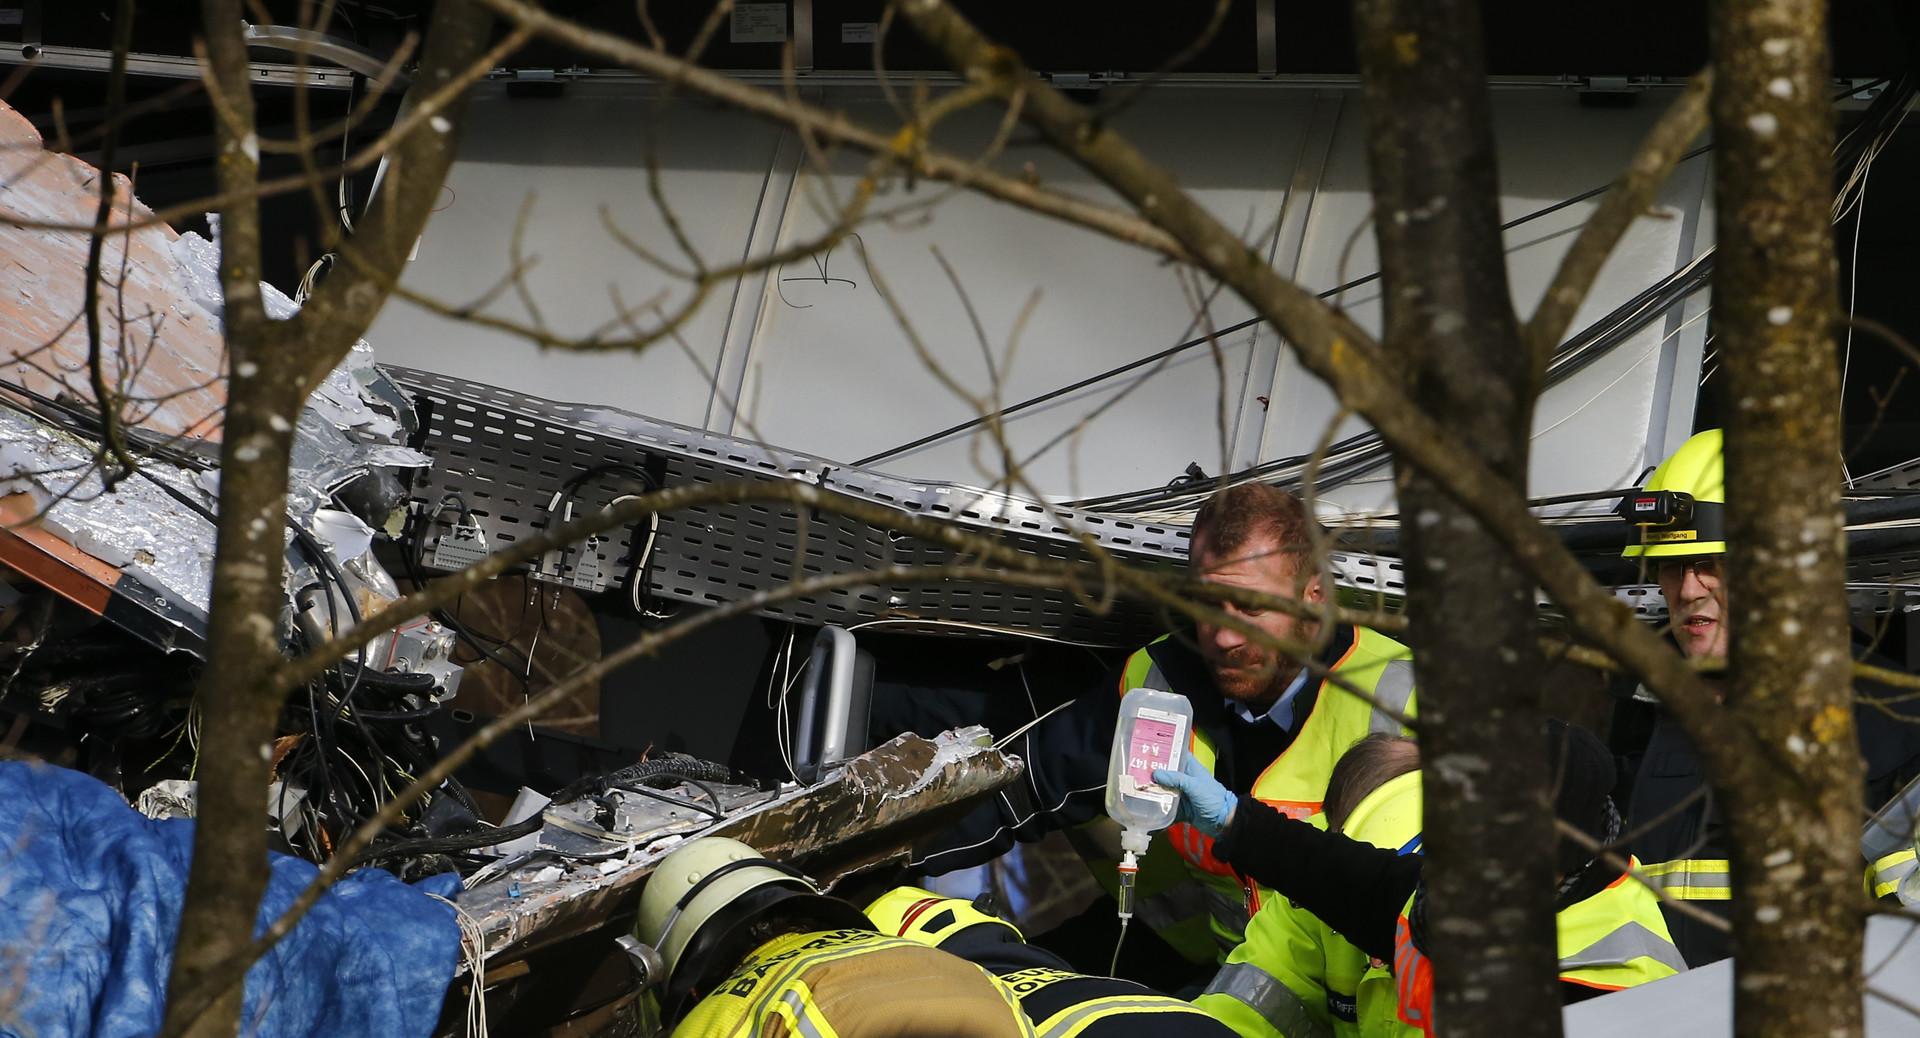 Schweres Zugunglück bei Bad Aibling forderte bisher zehn Tote